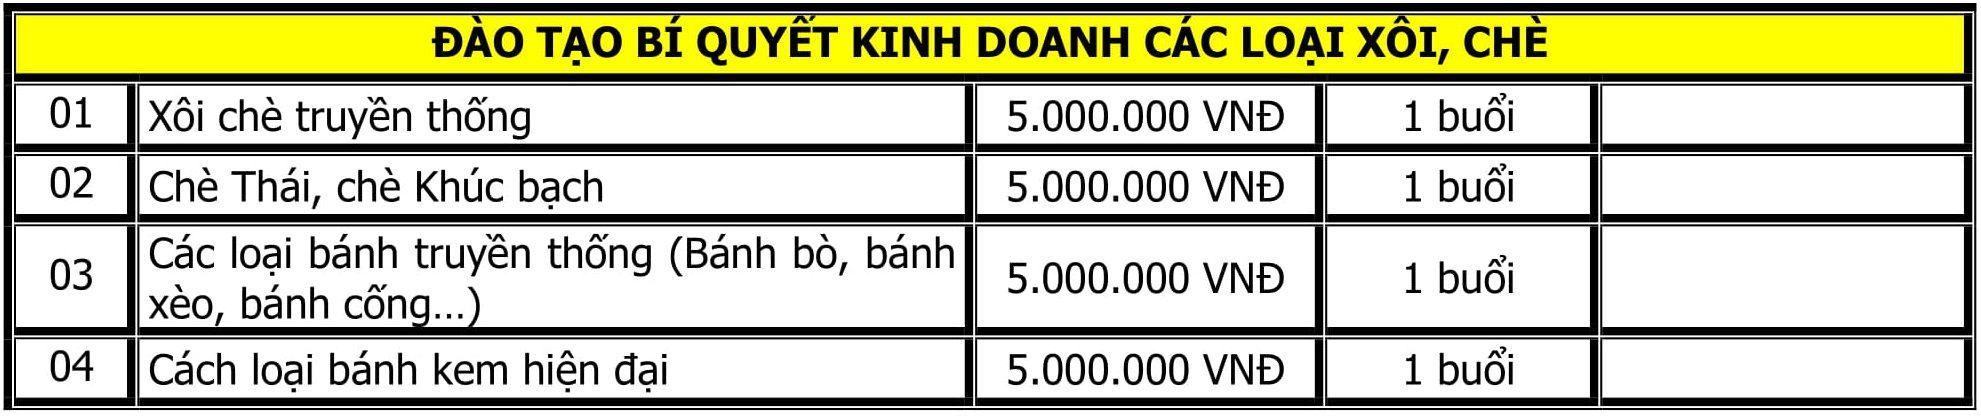 HOC PHI CAC KHOA DAO TAO-8